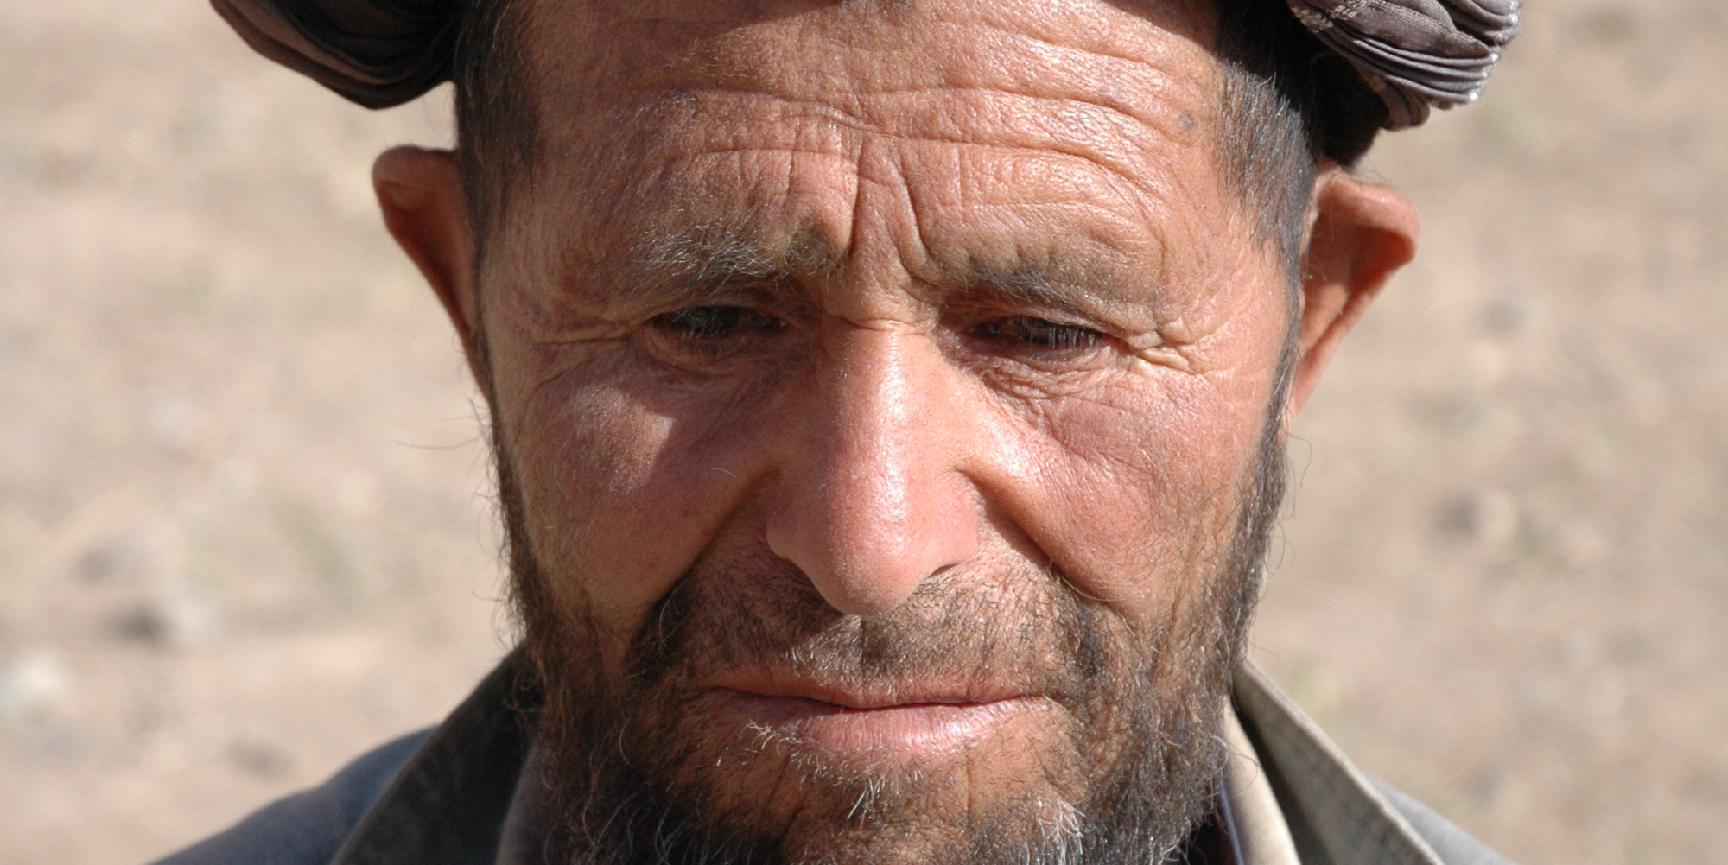 An elderly man in a turban